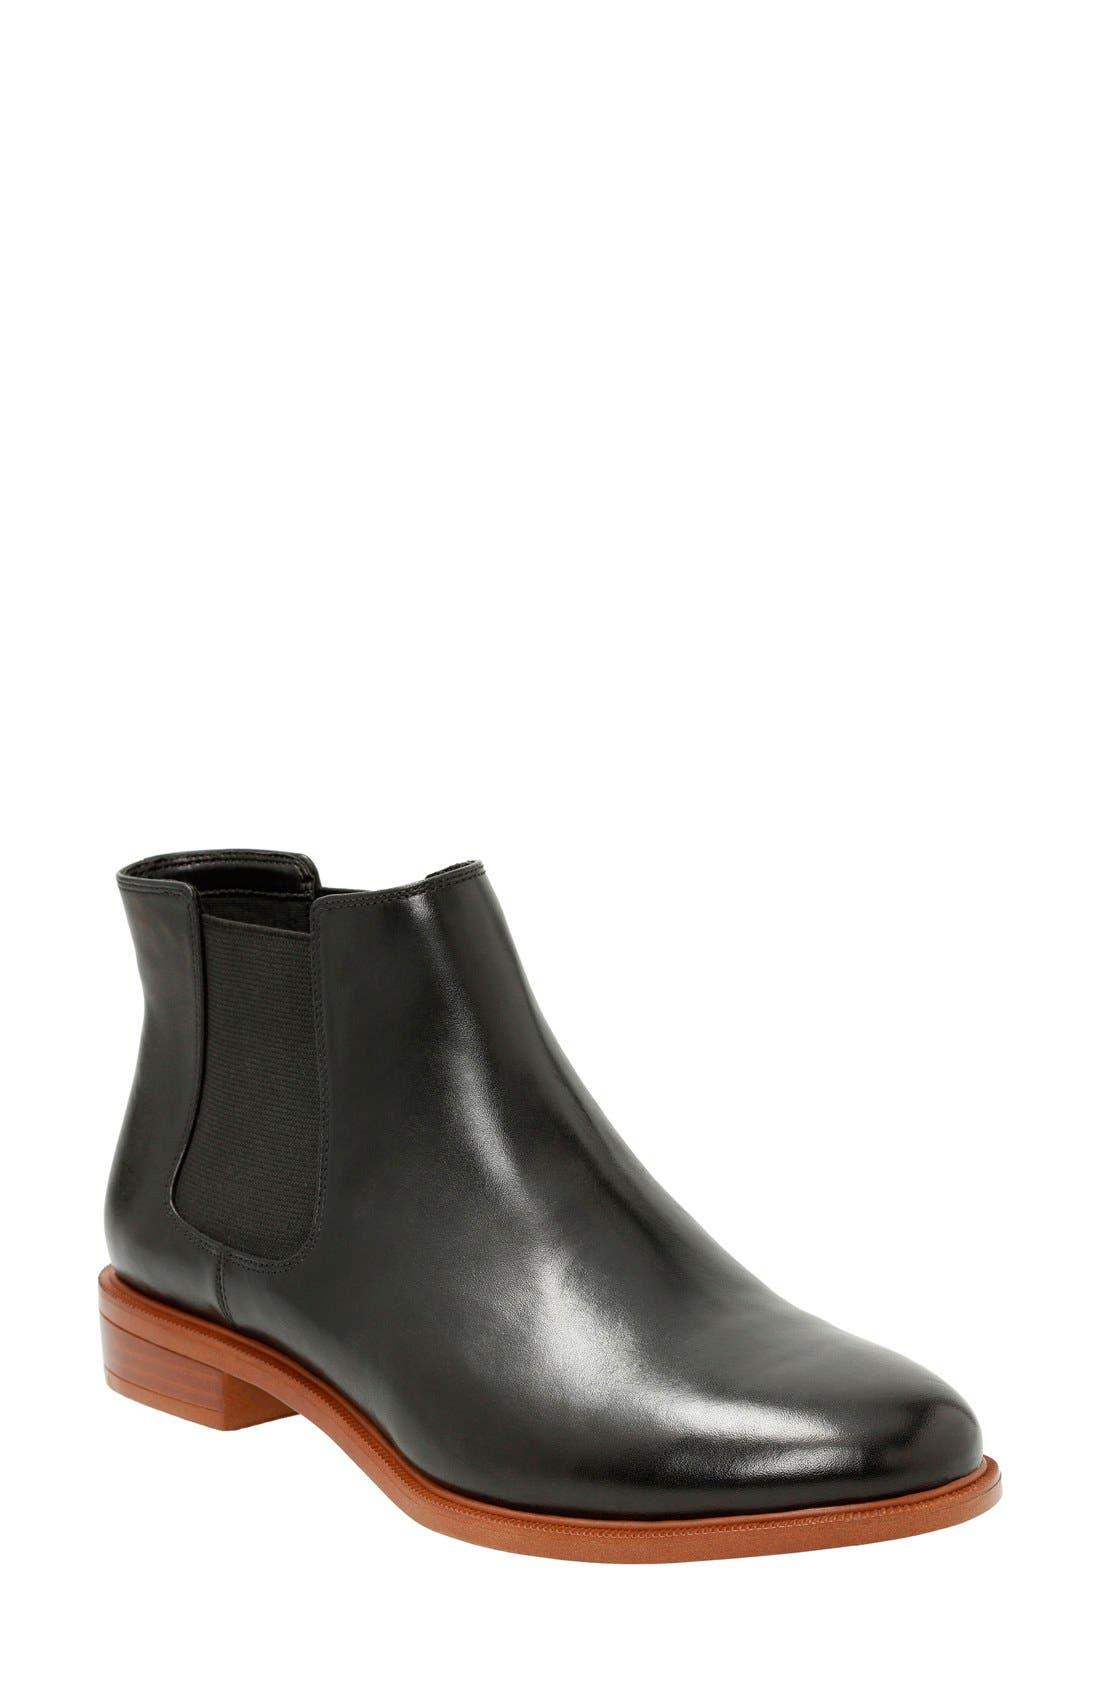 'Taylor Shine' Chelsea Boot,                             Main thumbnail 1, color,                             Black Leather